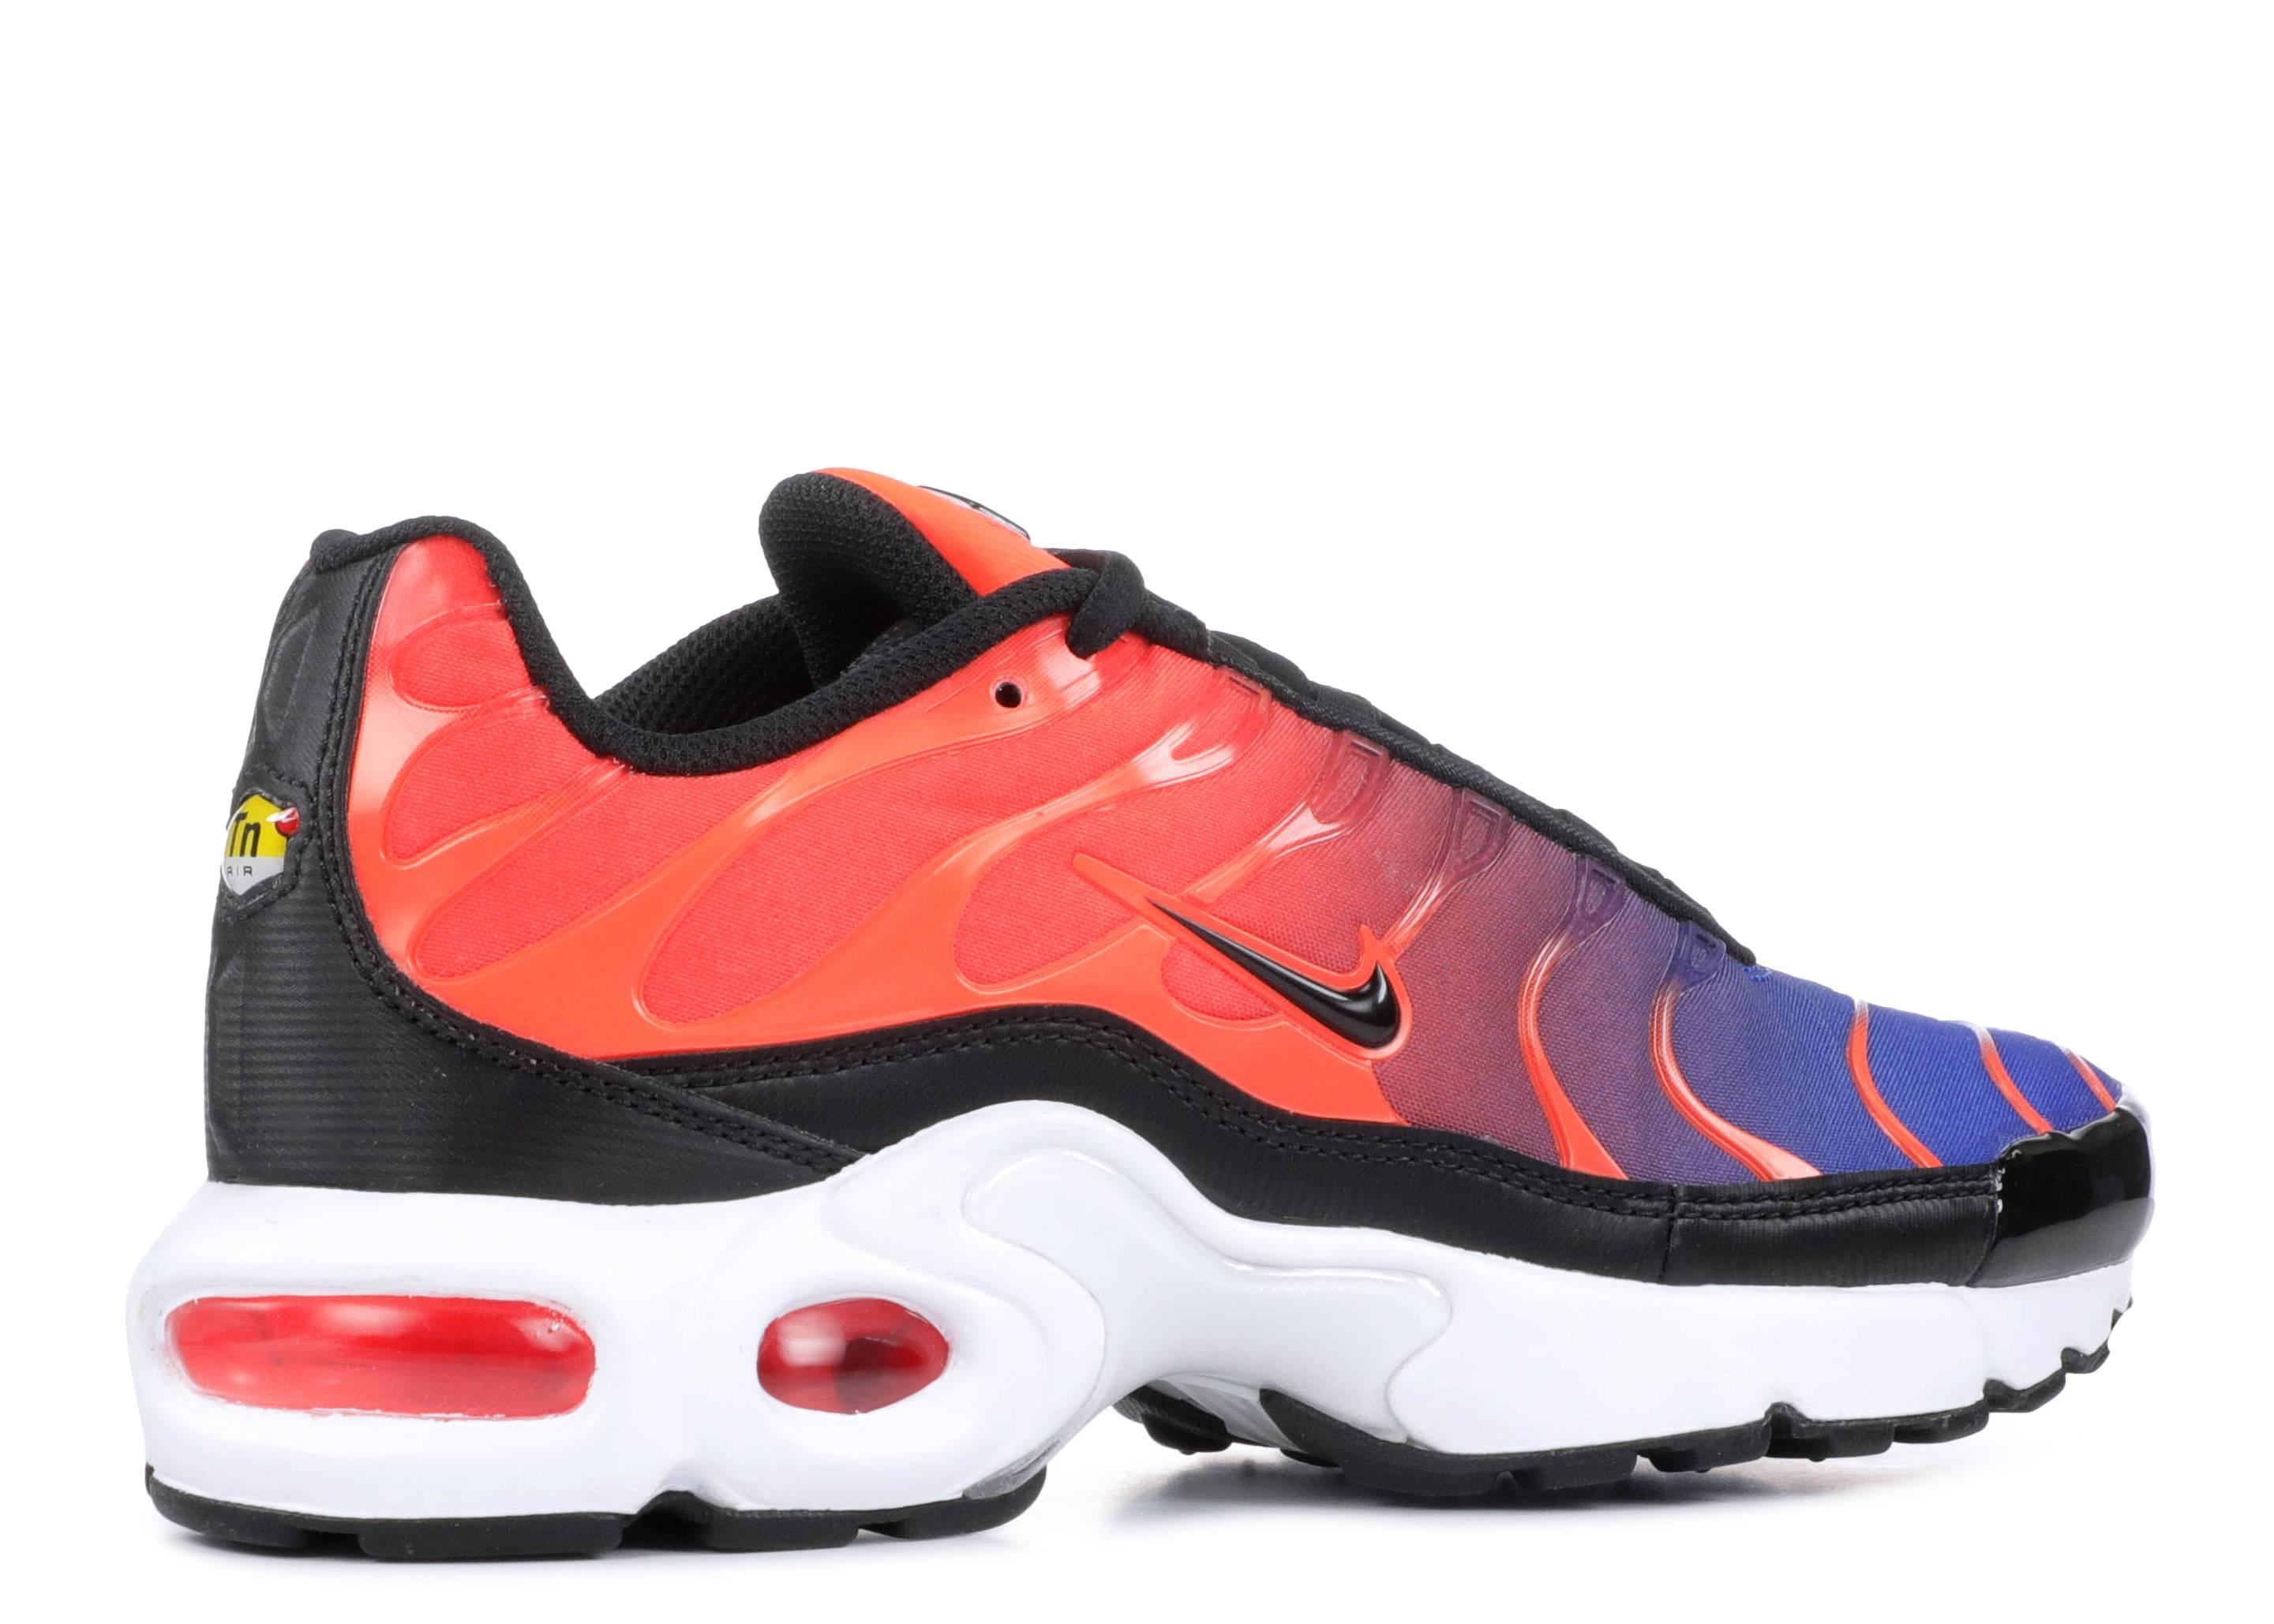 Details about Nike Air Max Plus SE Tn Size 4Y Women's 5.5